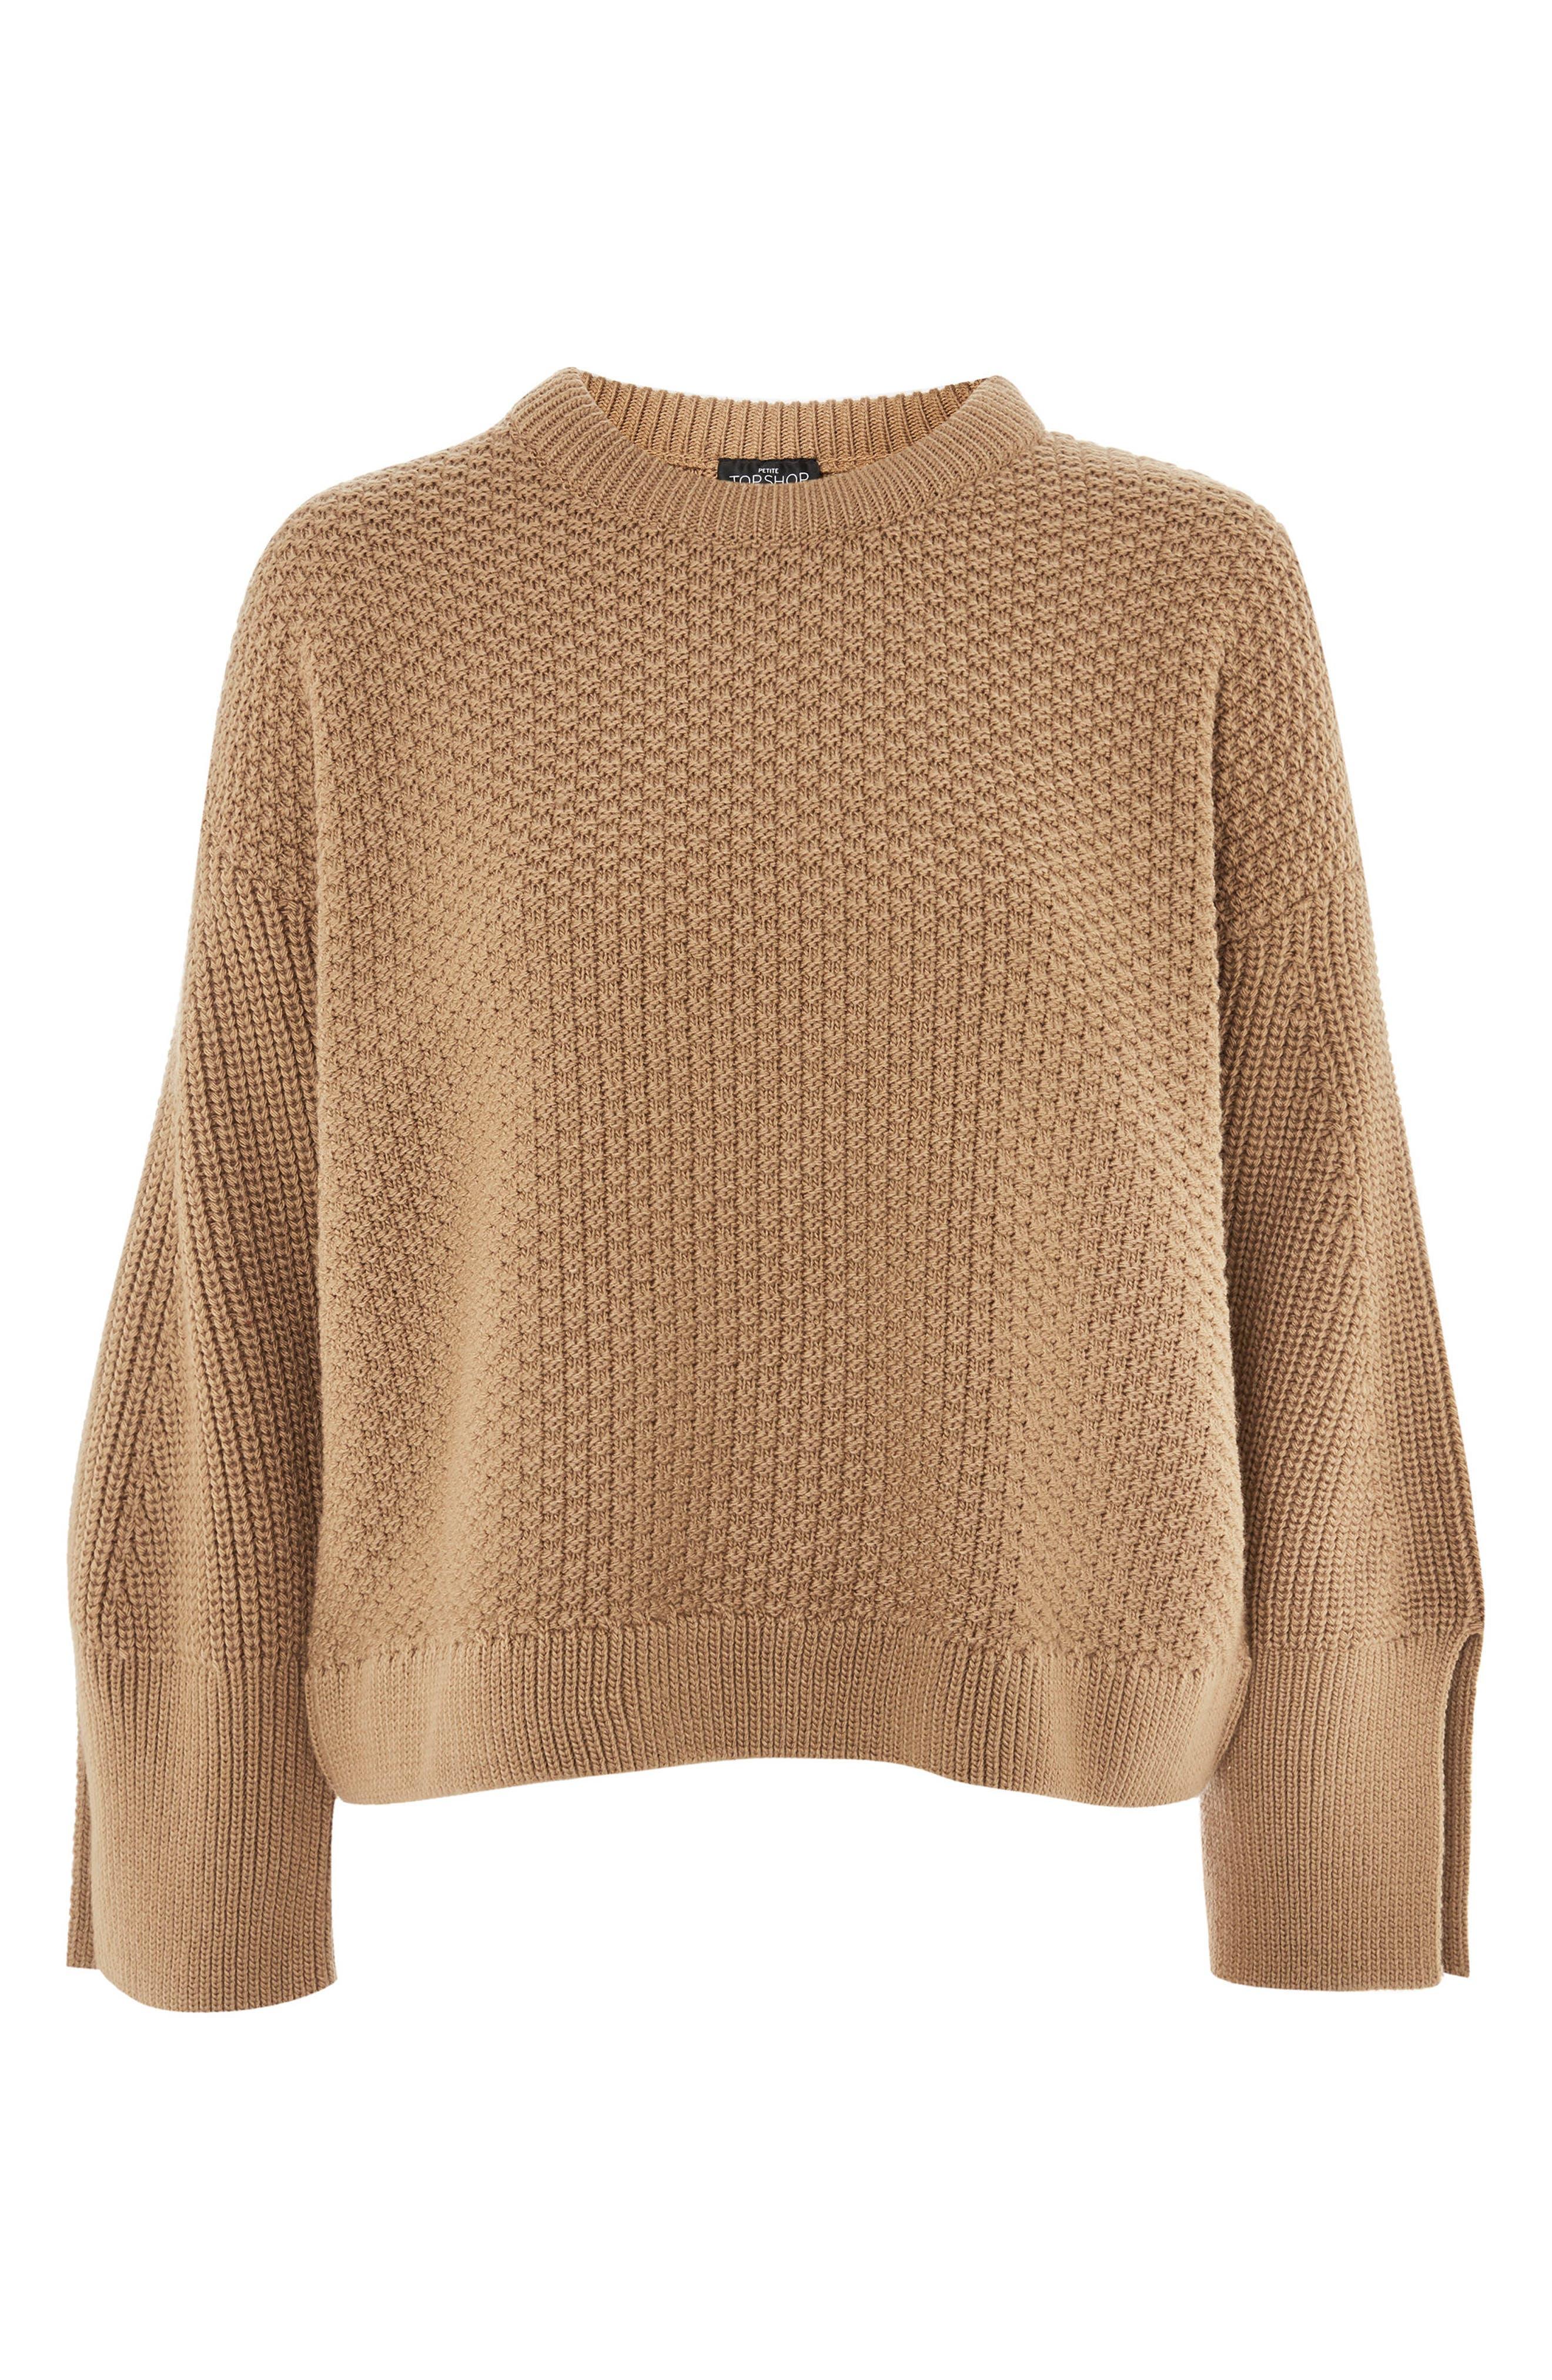 Petite Moss Stitch Sweater,                             Alternate thumbnail 4, color,                             252